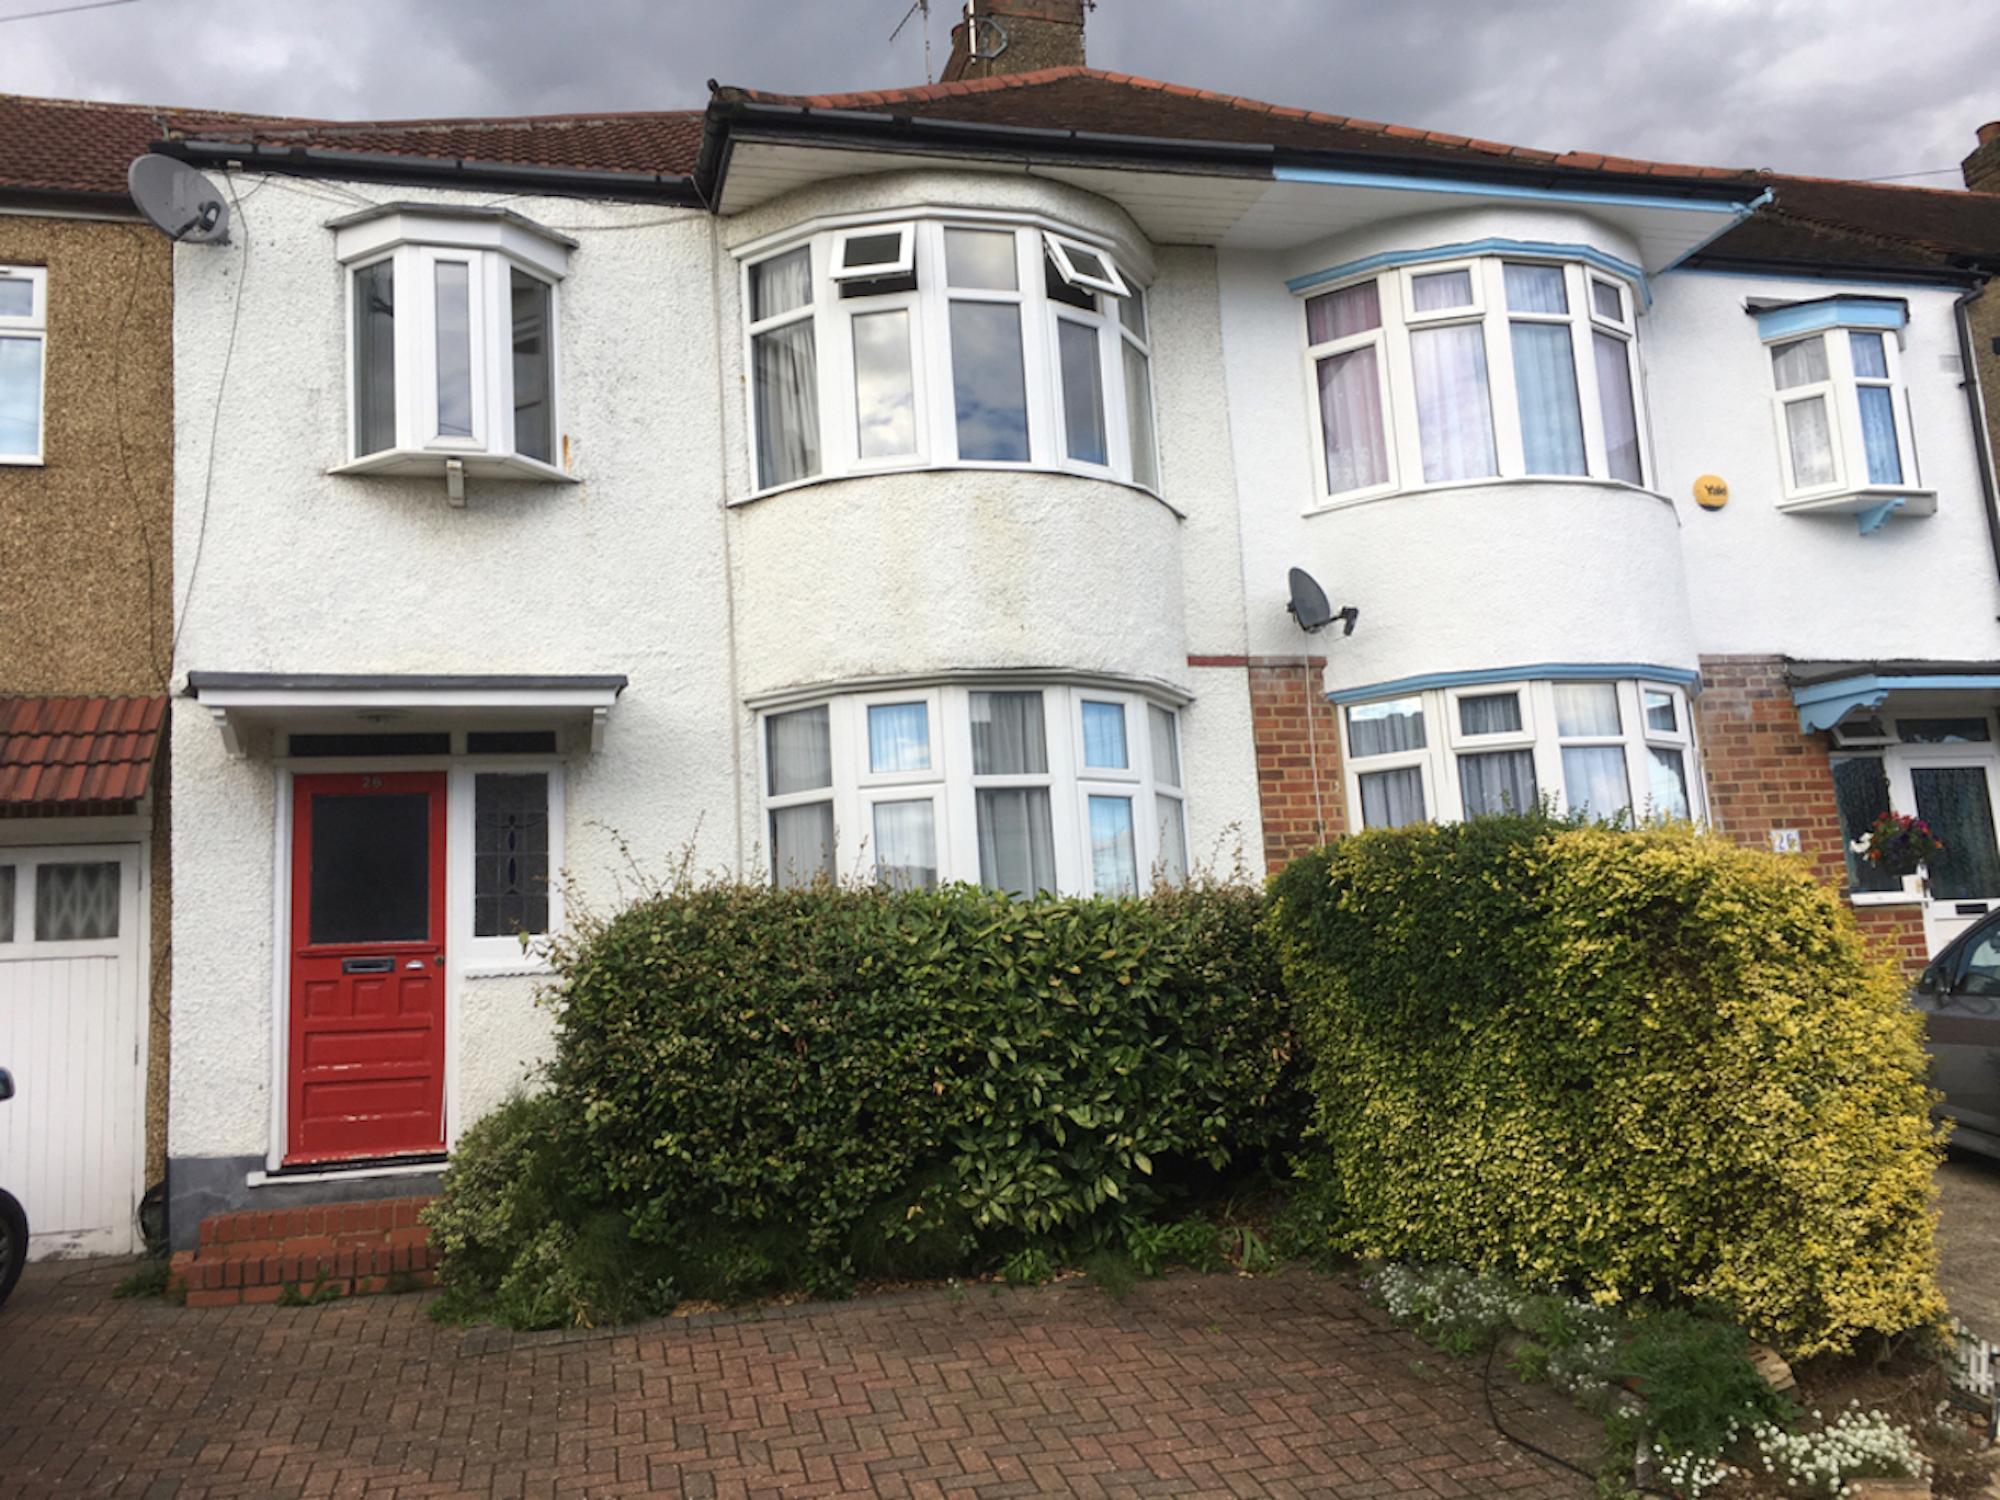 Luminous 7 beds house in Harrow